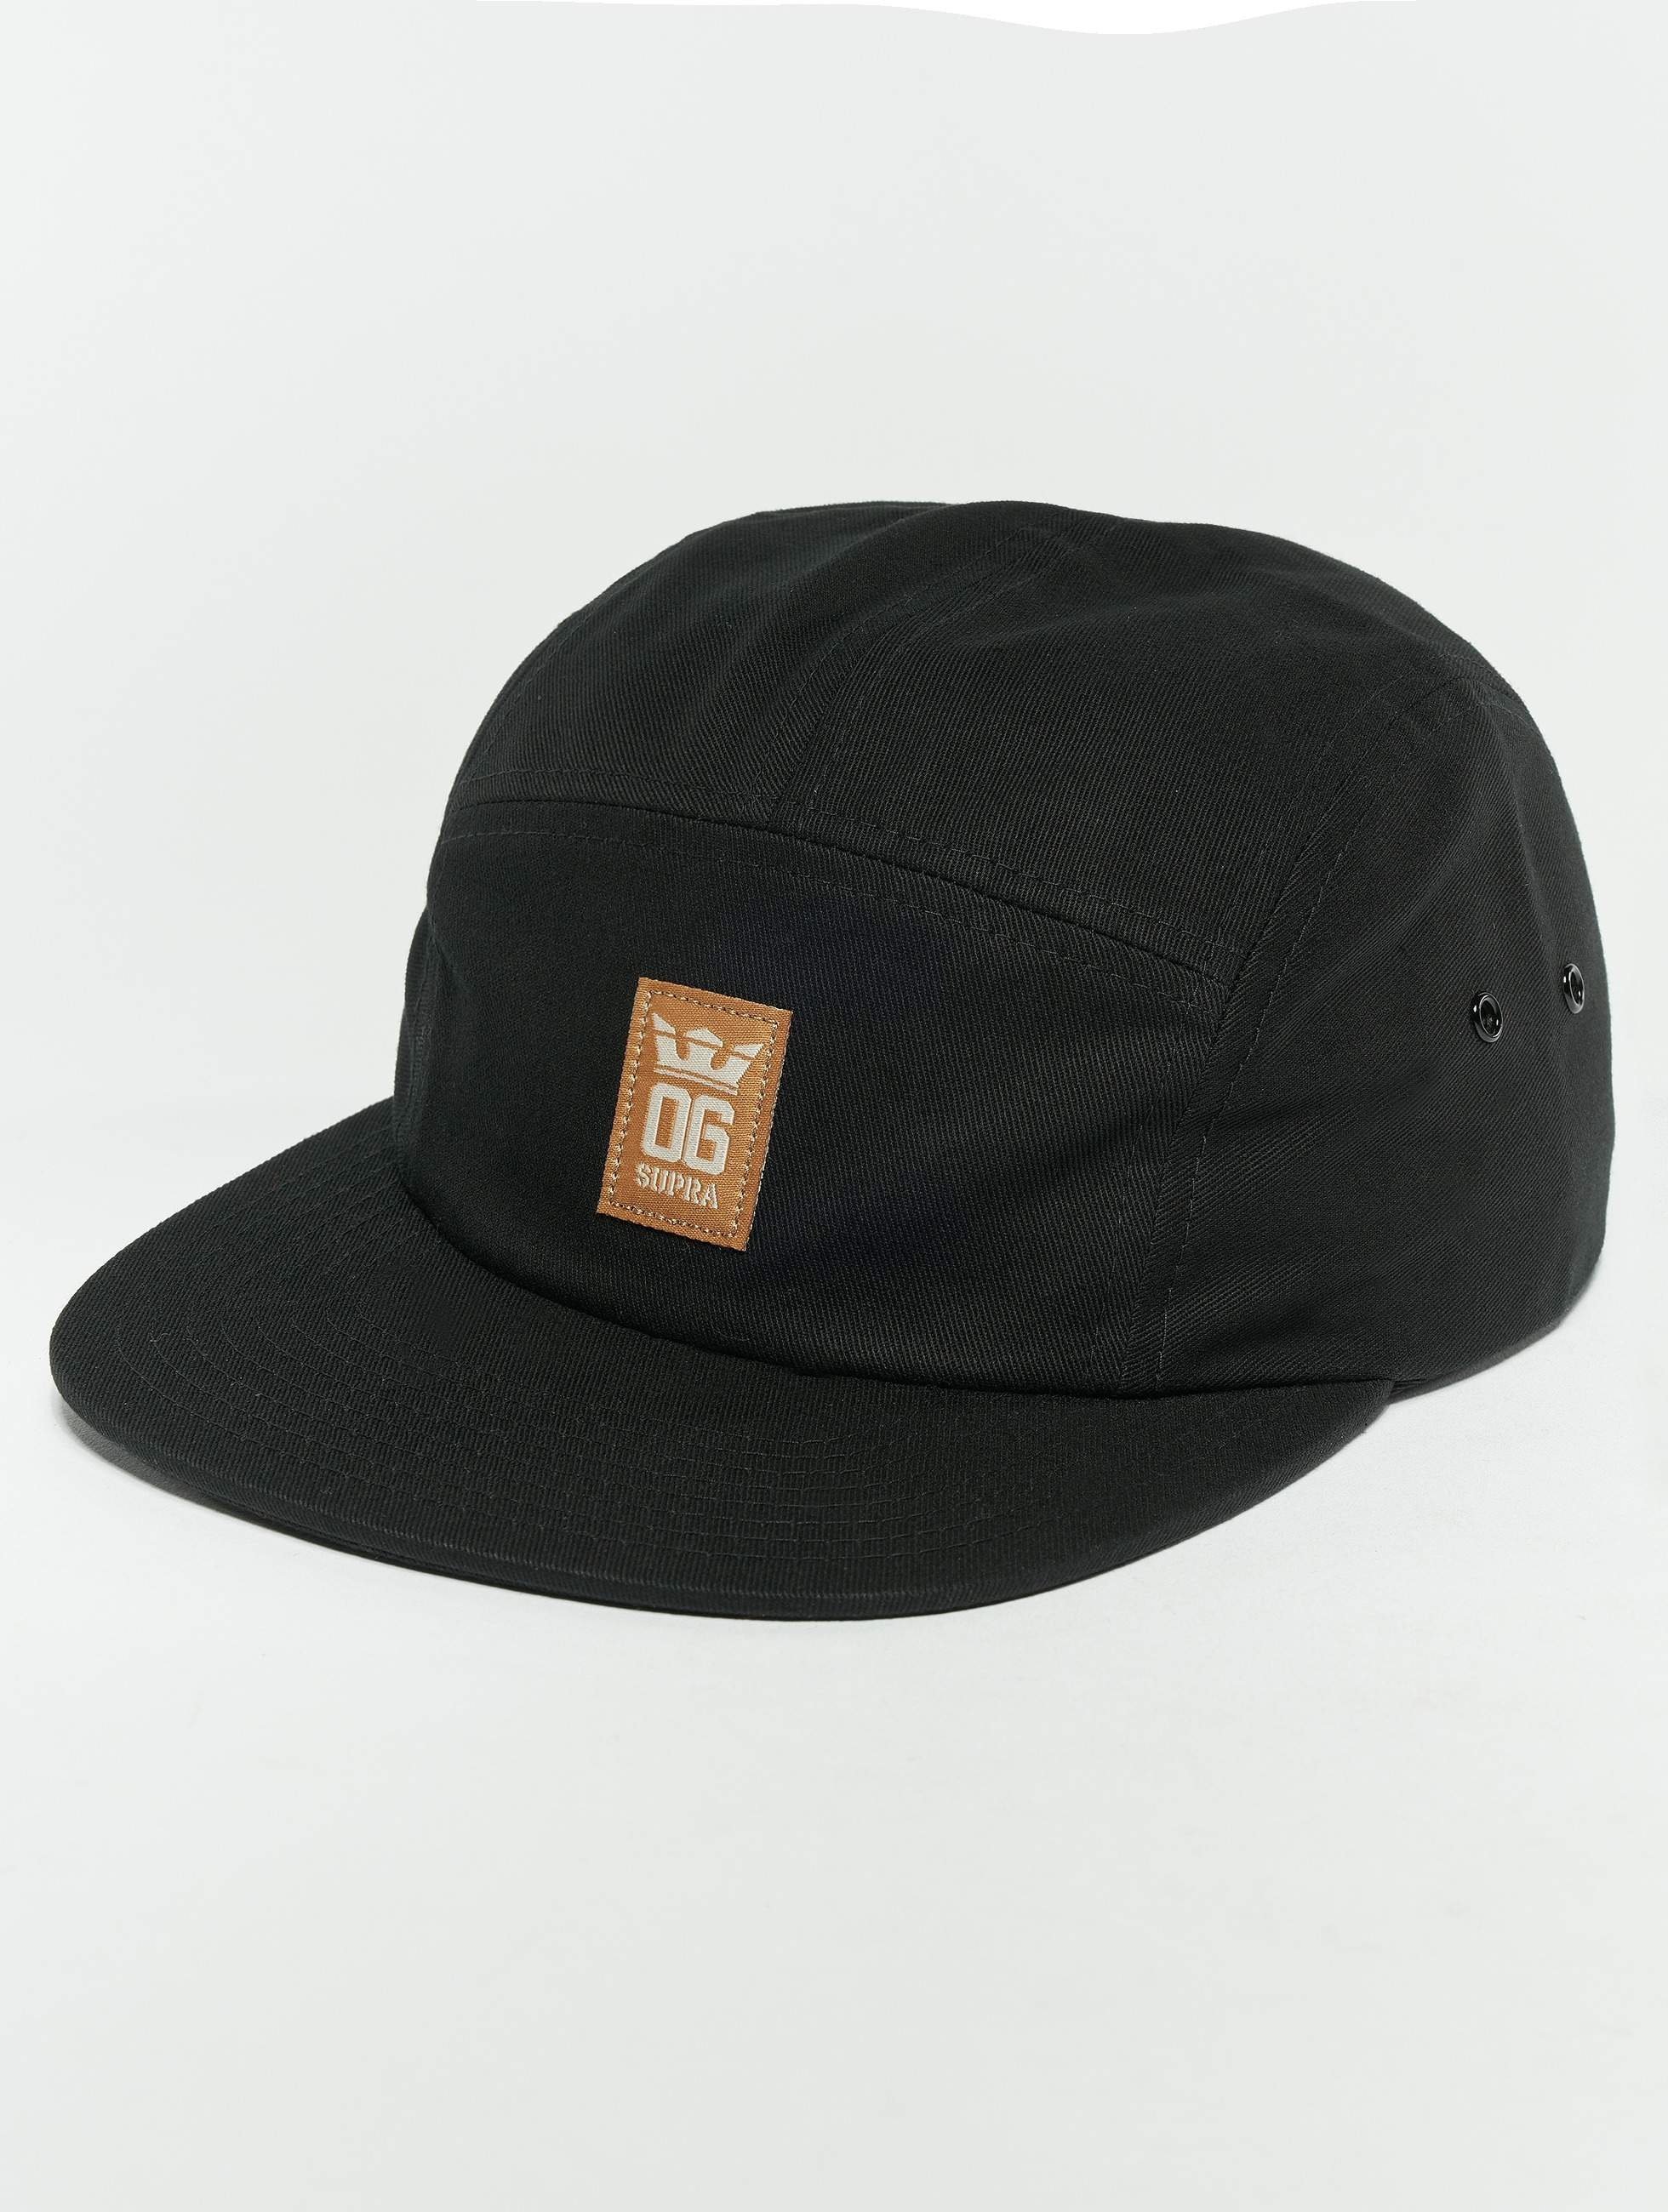 Supra   Og Crown 5 Panel Hat Snapback Cap noir Homme Casquette 5 panel